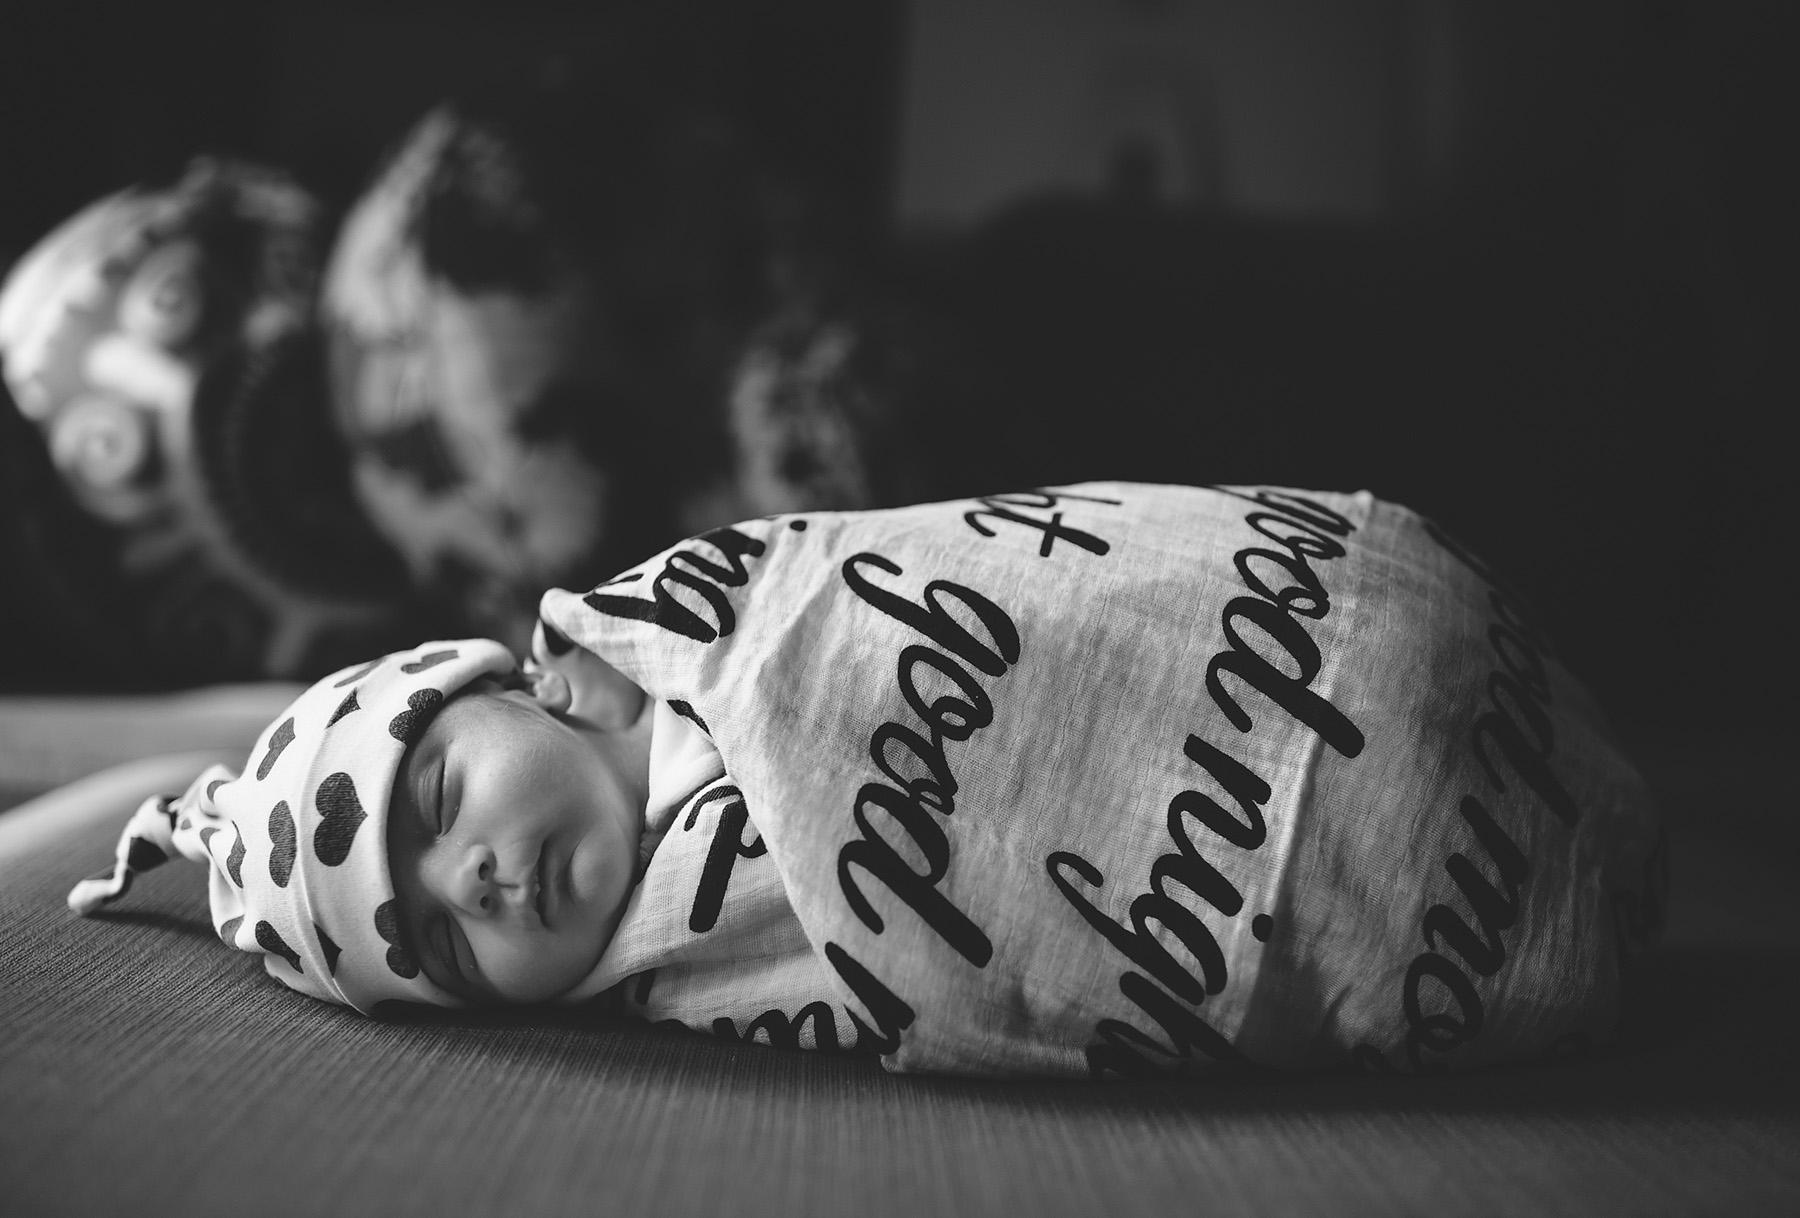 south-florida-newborn-photographer-celebrities-stars-baby.jpg